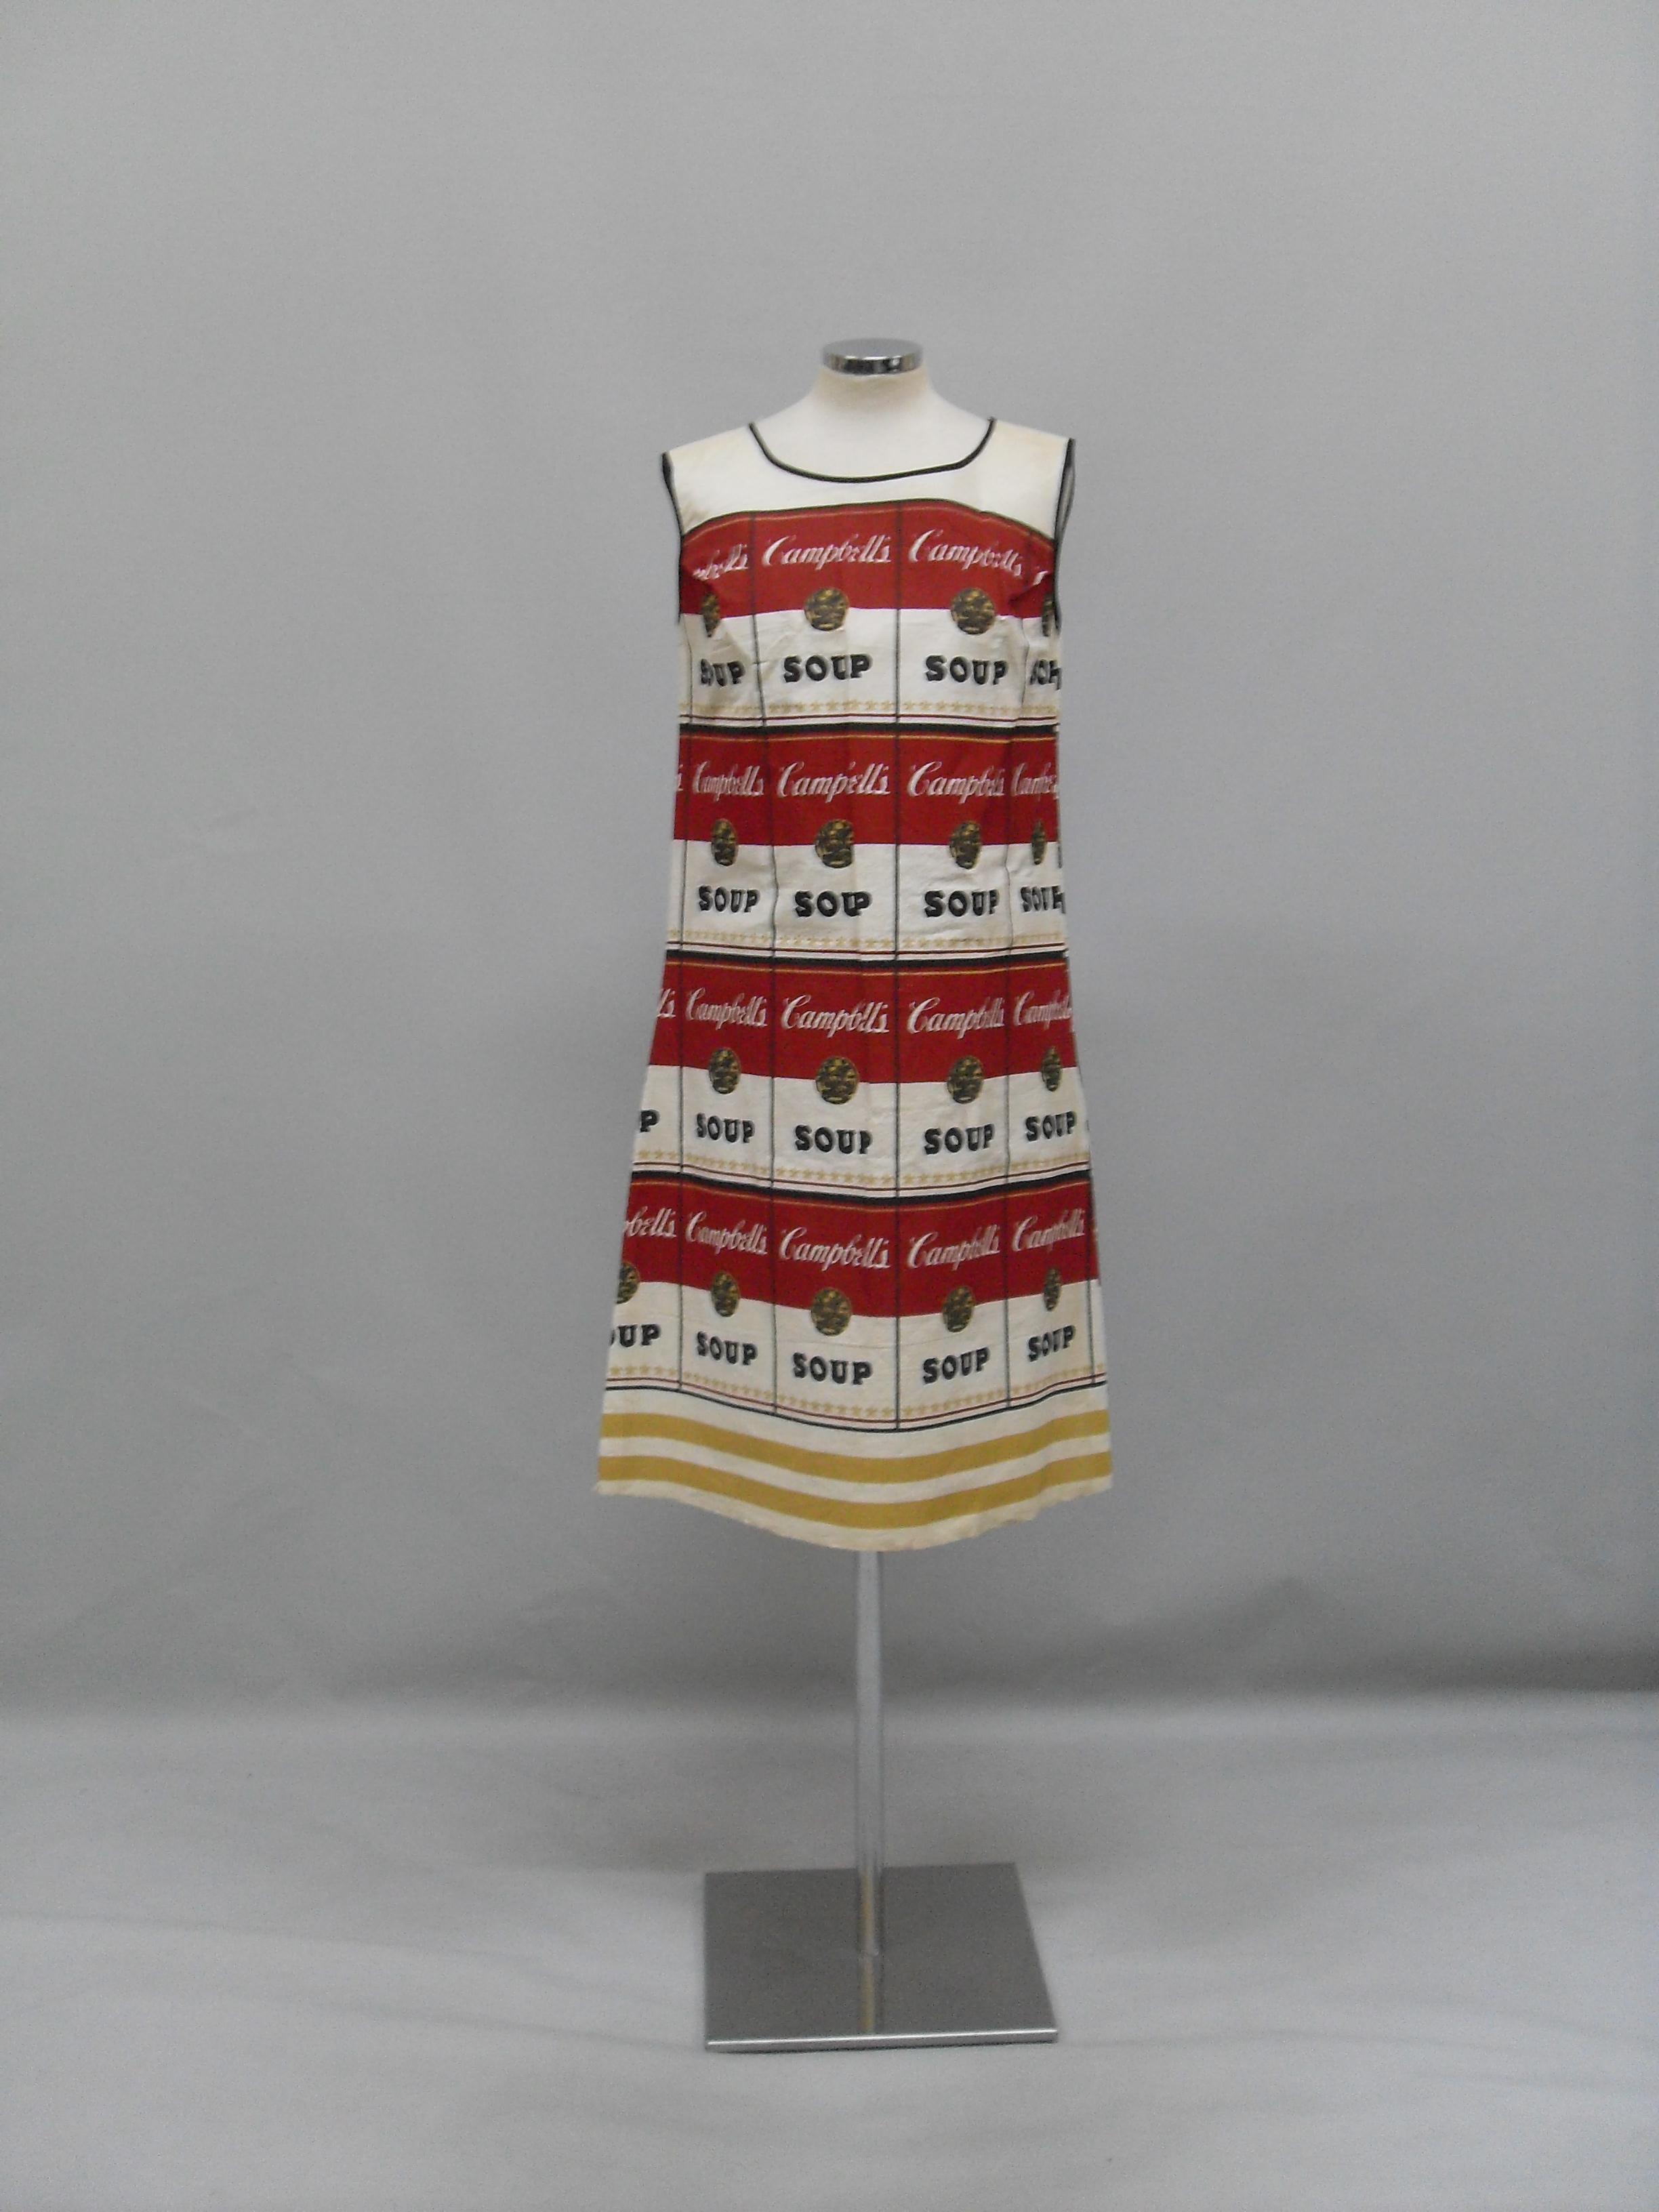 Spunbond Nonwoven Fabrics Market in 360MarketUpdates.com